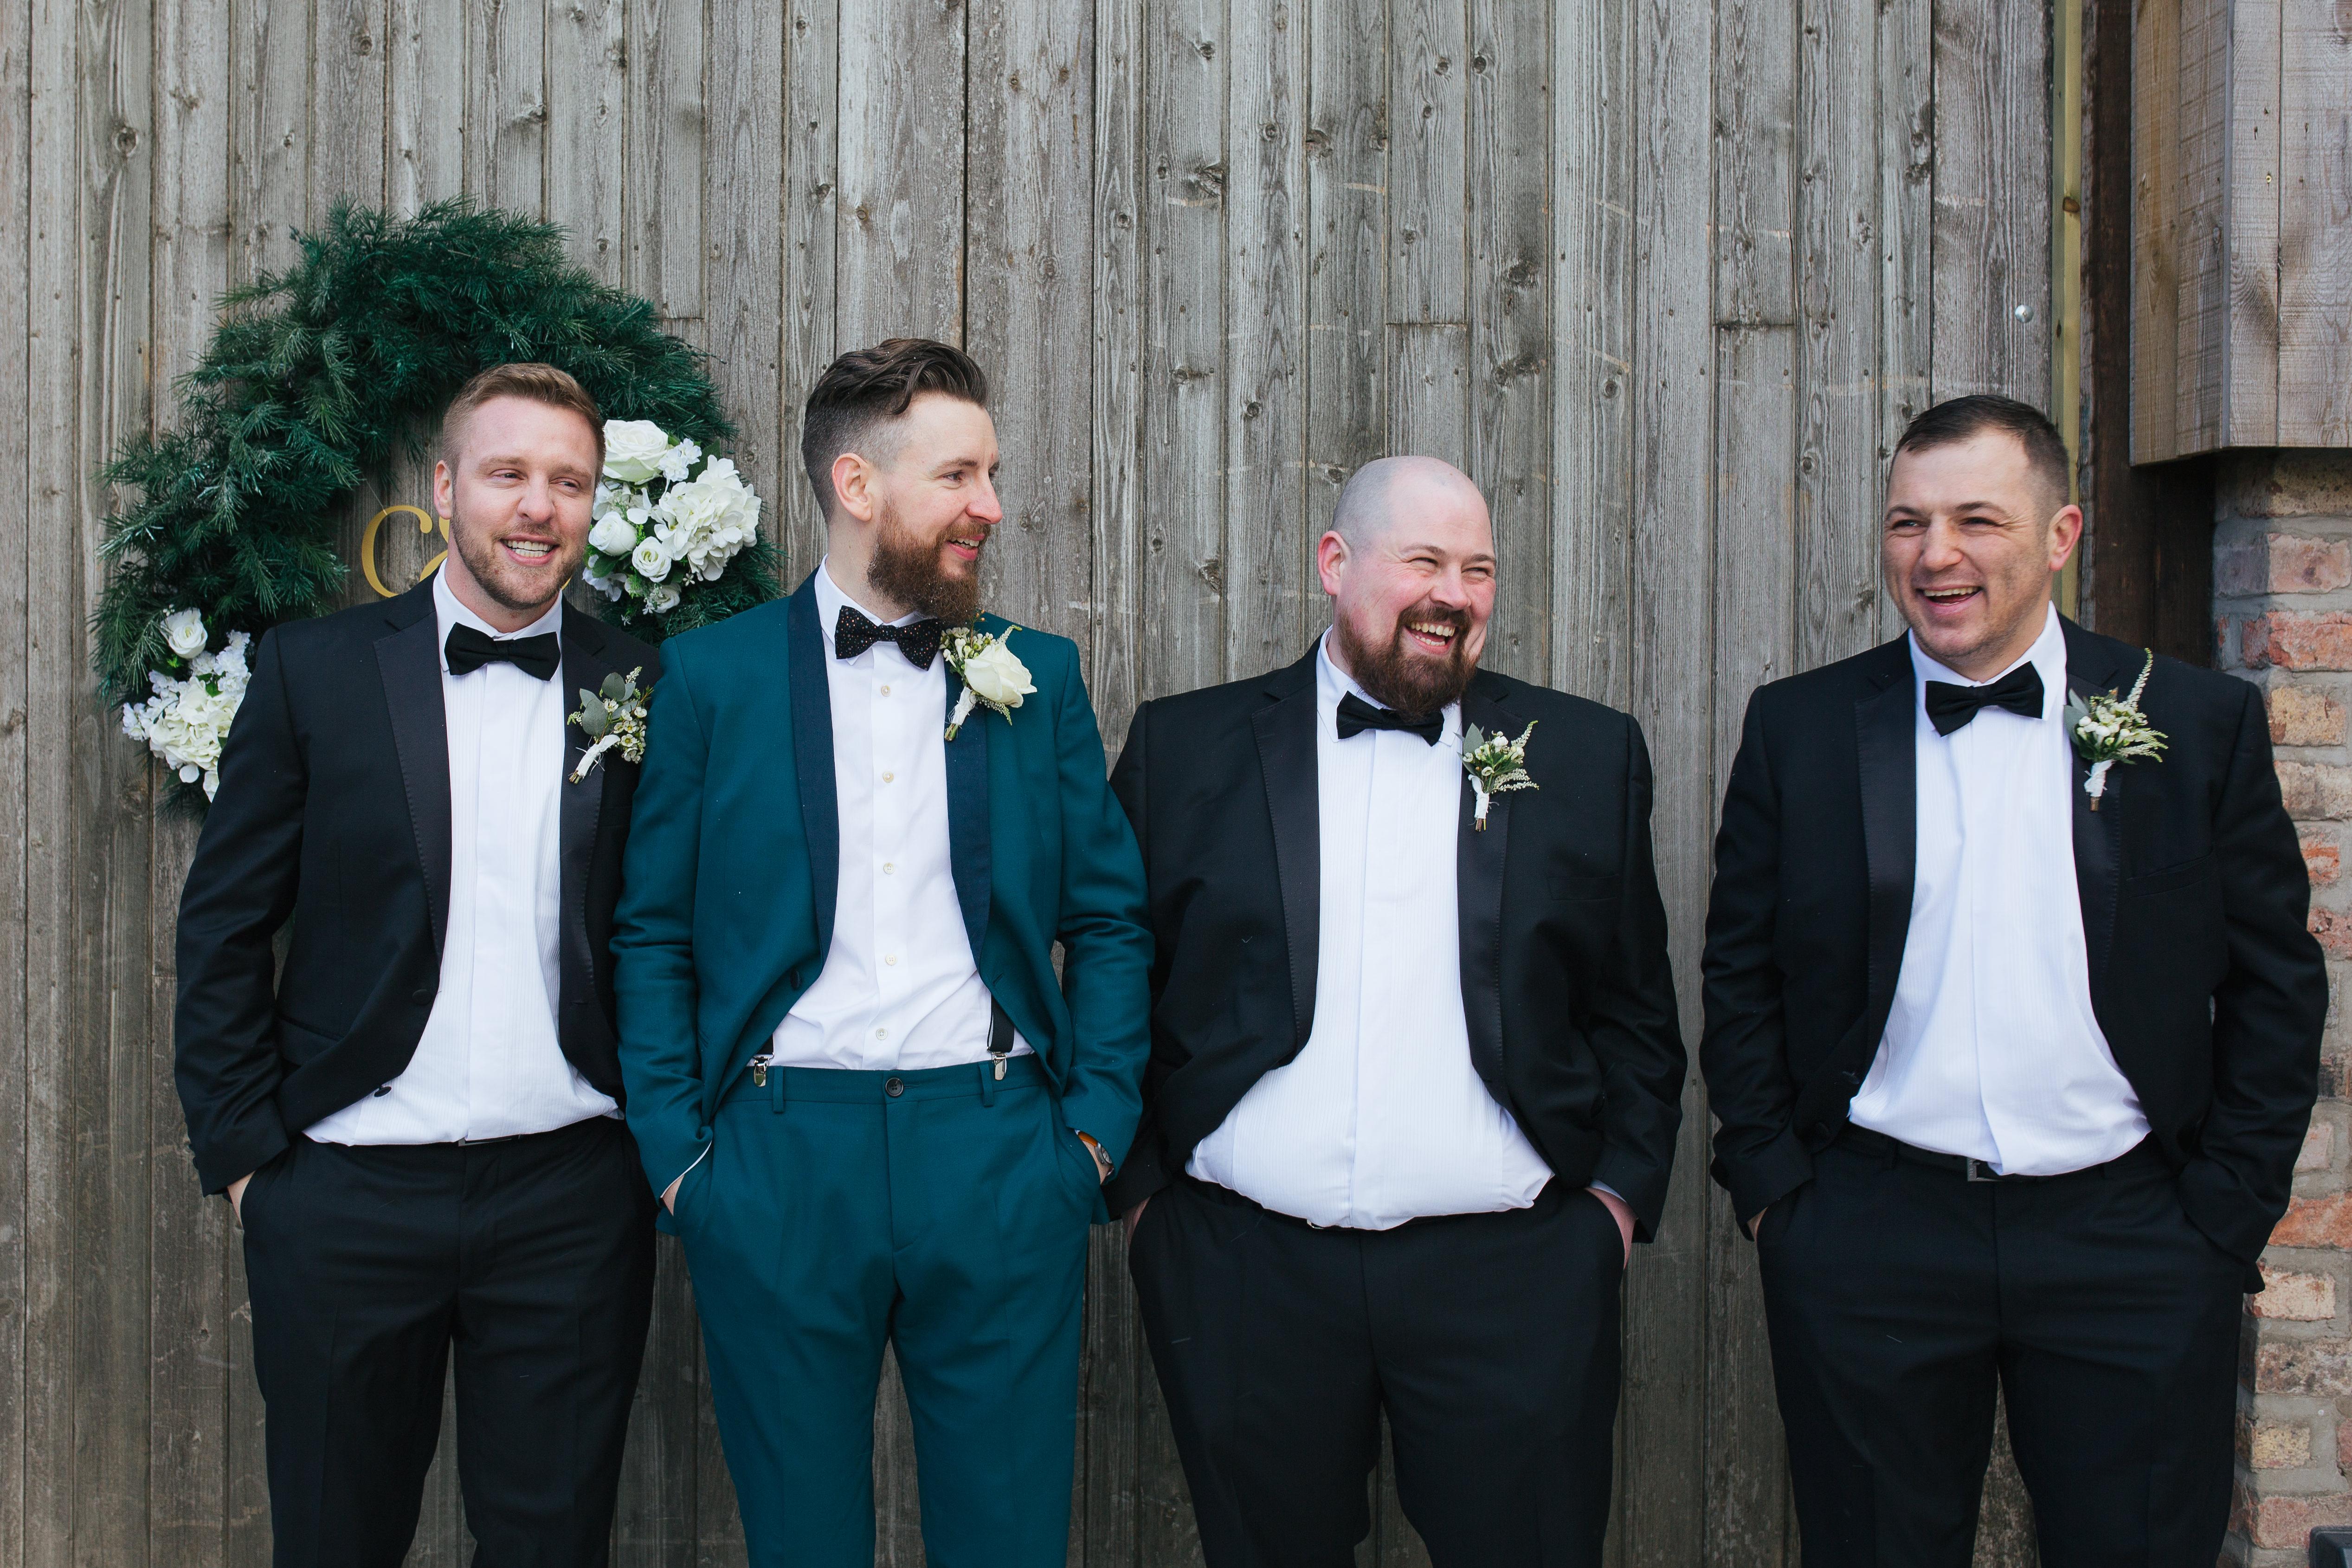 The Normans weddings groom